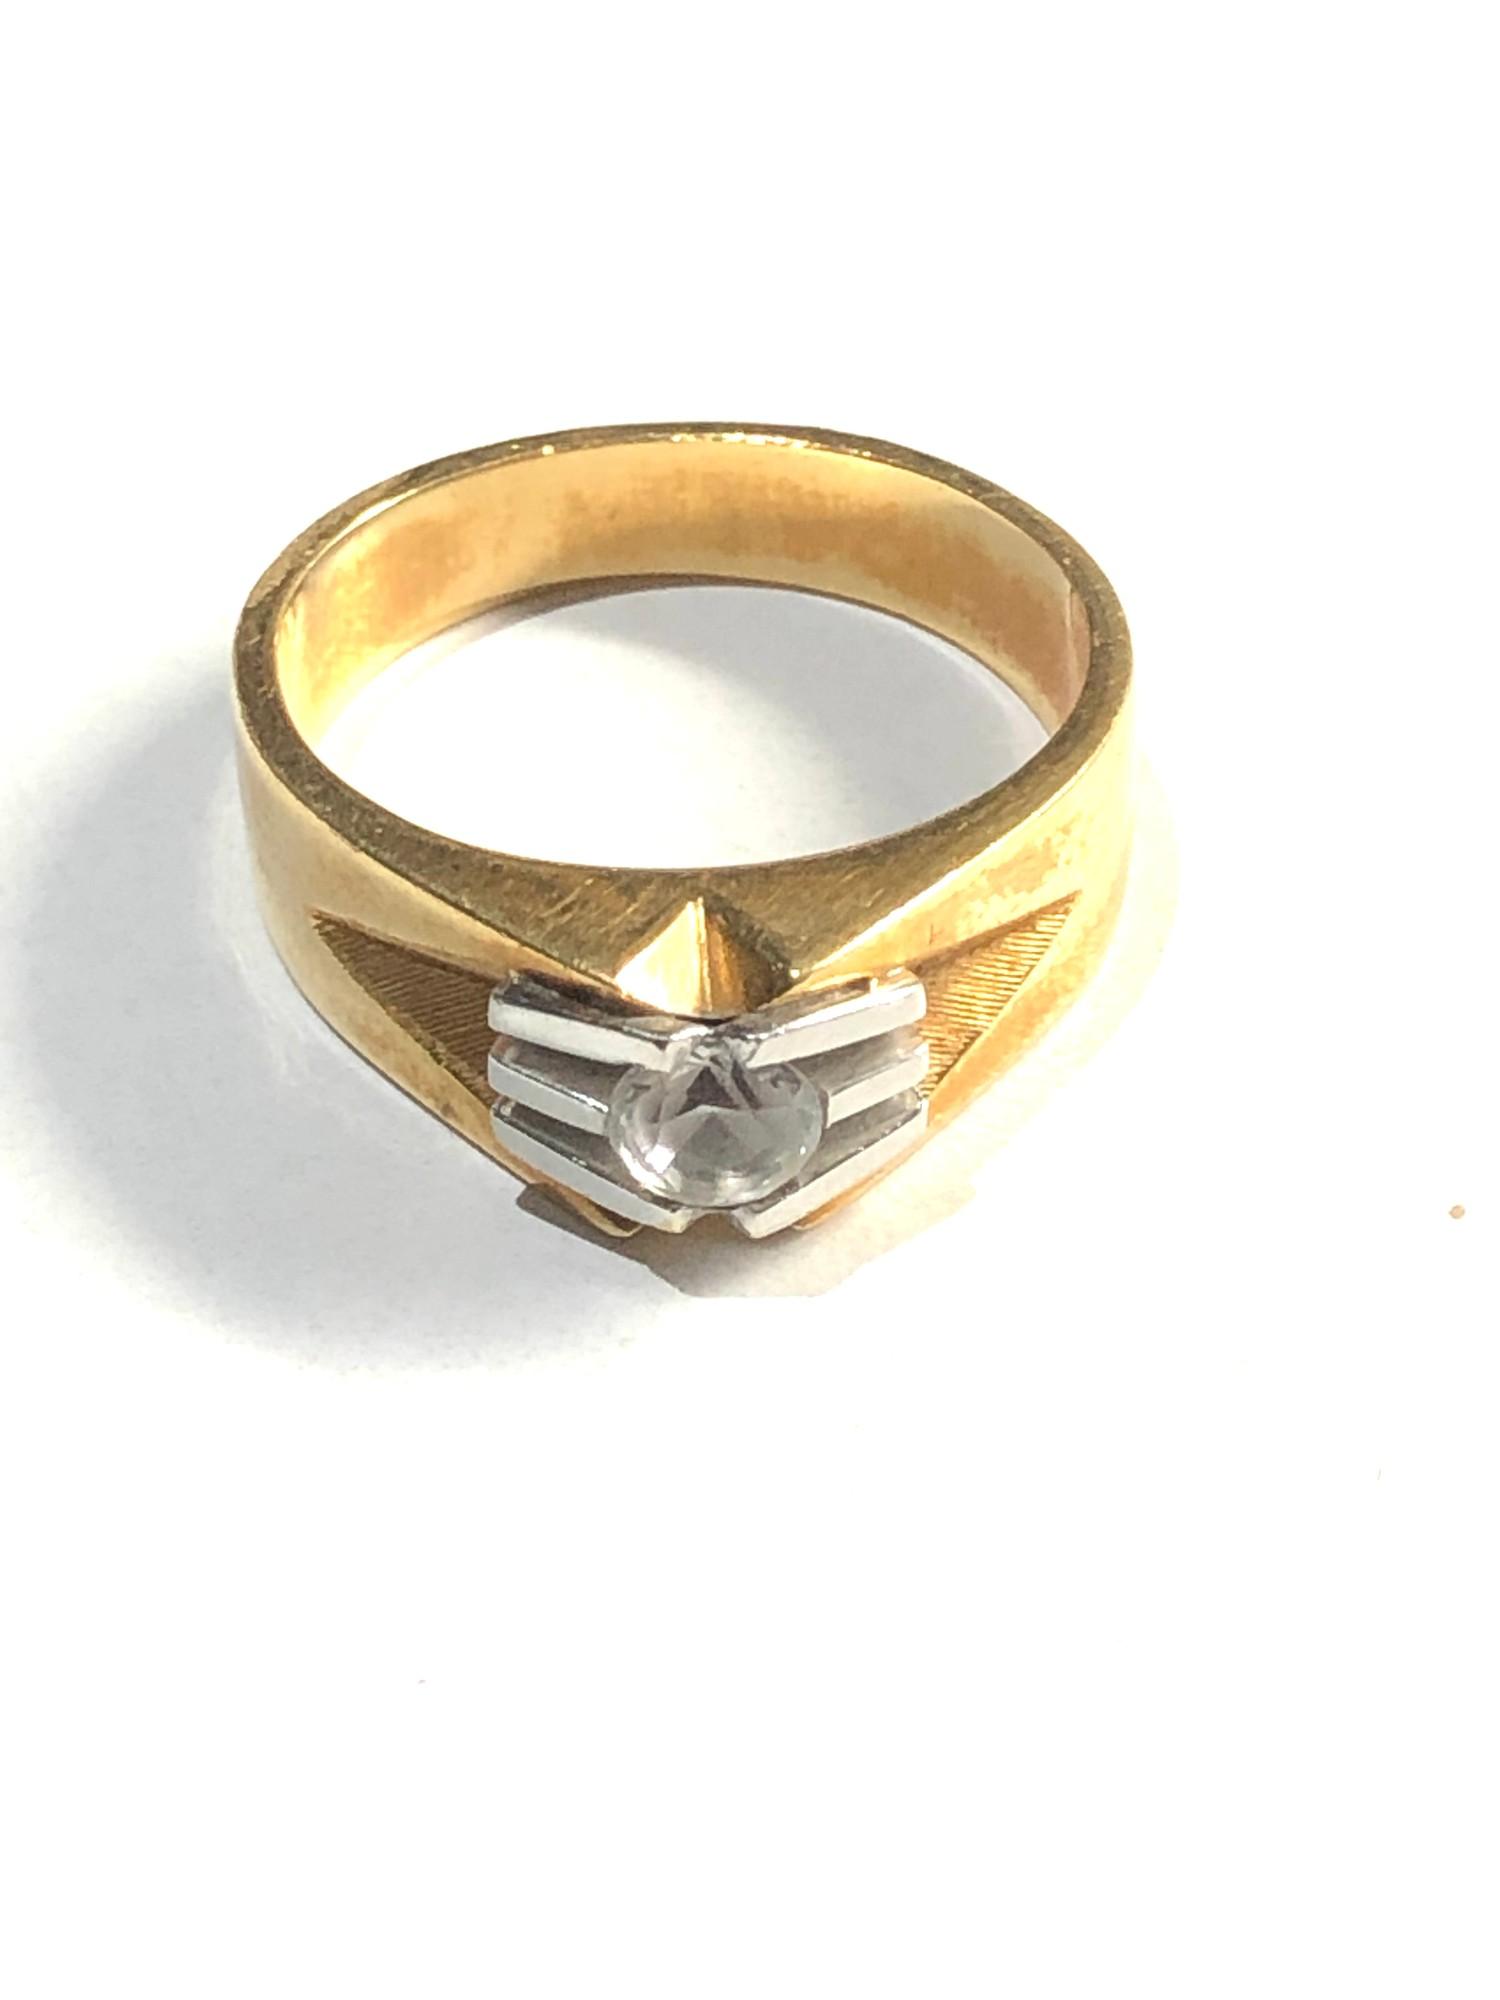 18ct stone set modernist design ring 6.8g